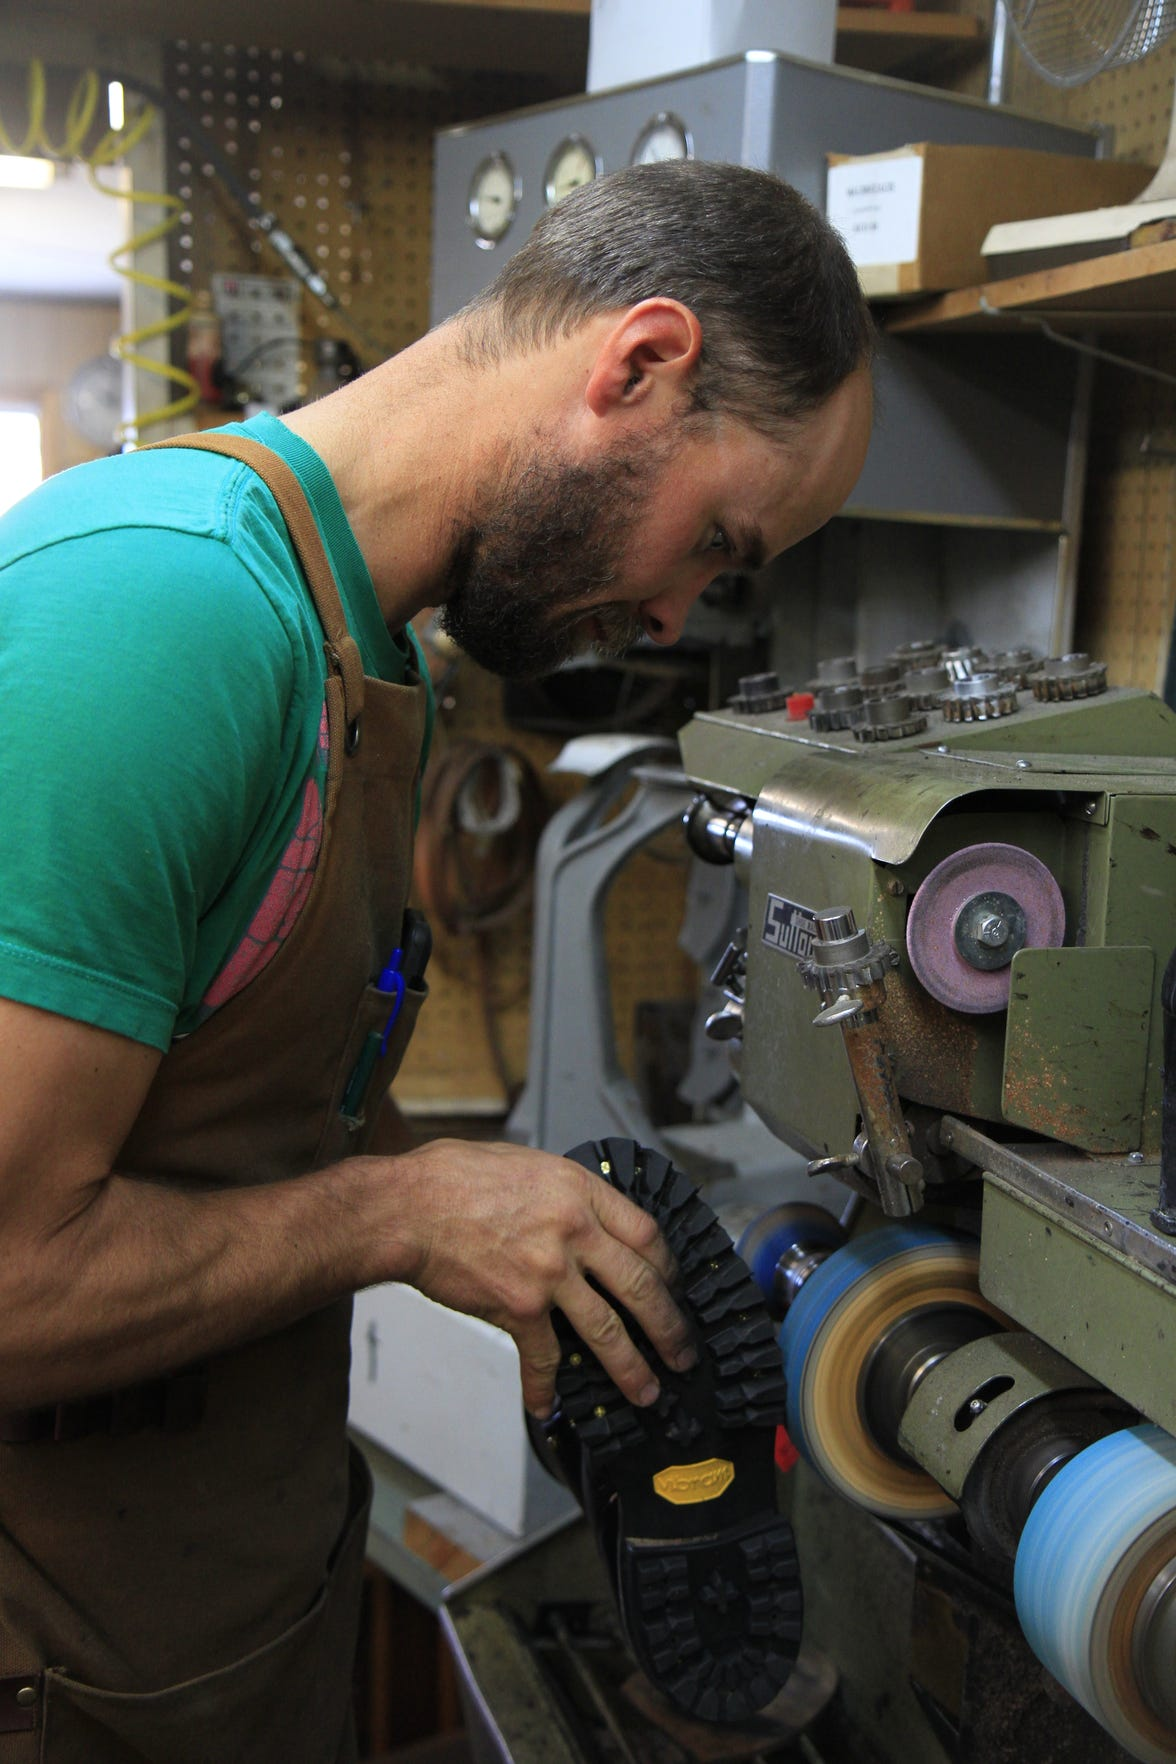 Tom Barrett repairing a shoe in his apprenticeship at Siller's Boot and Shoe Repair.